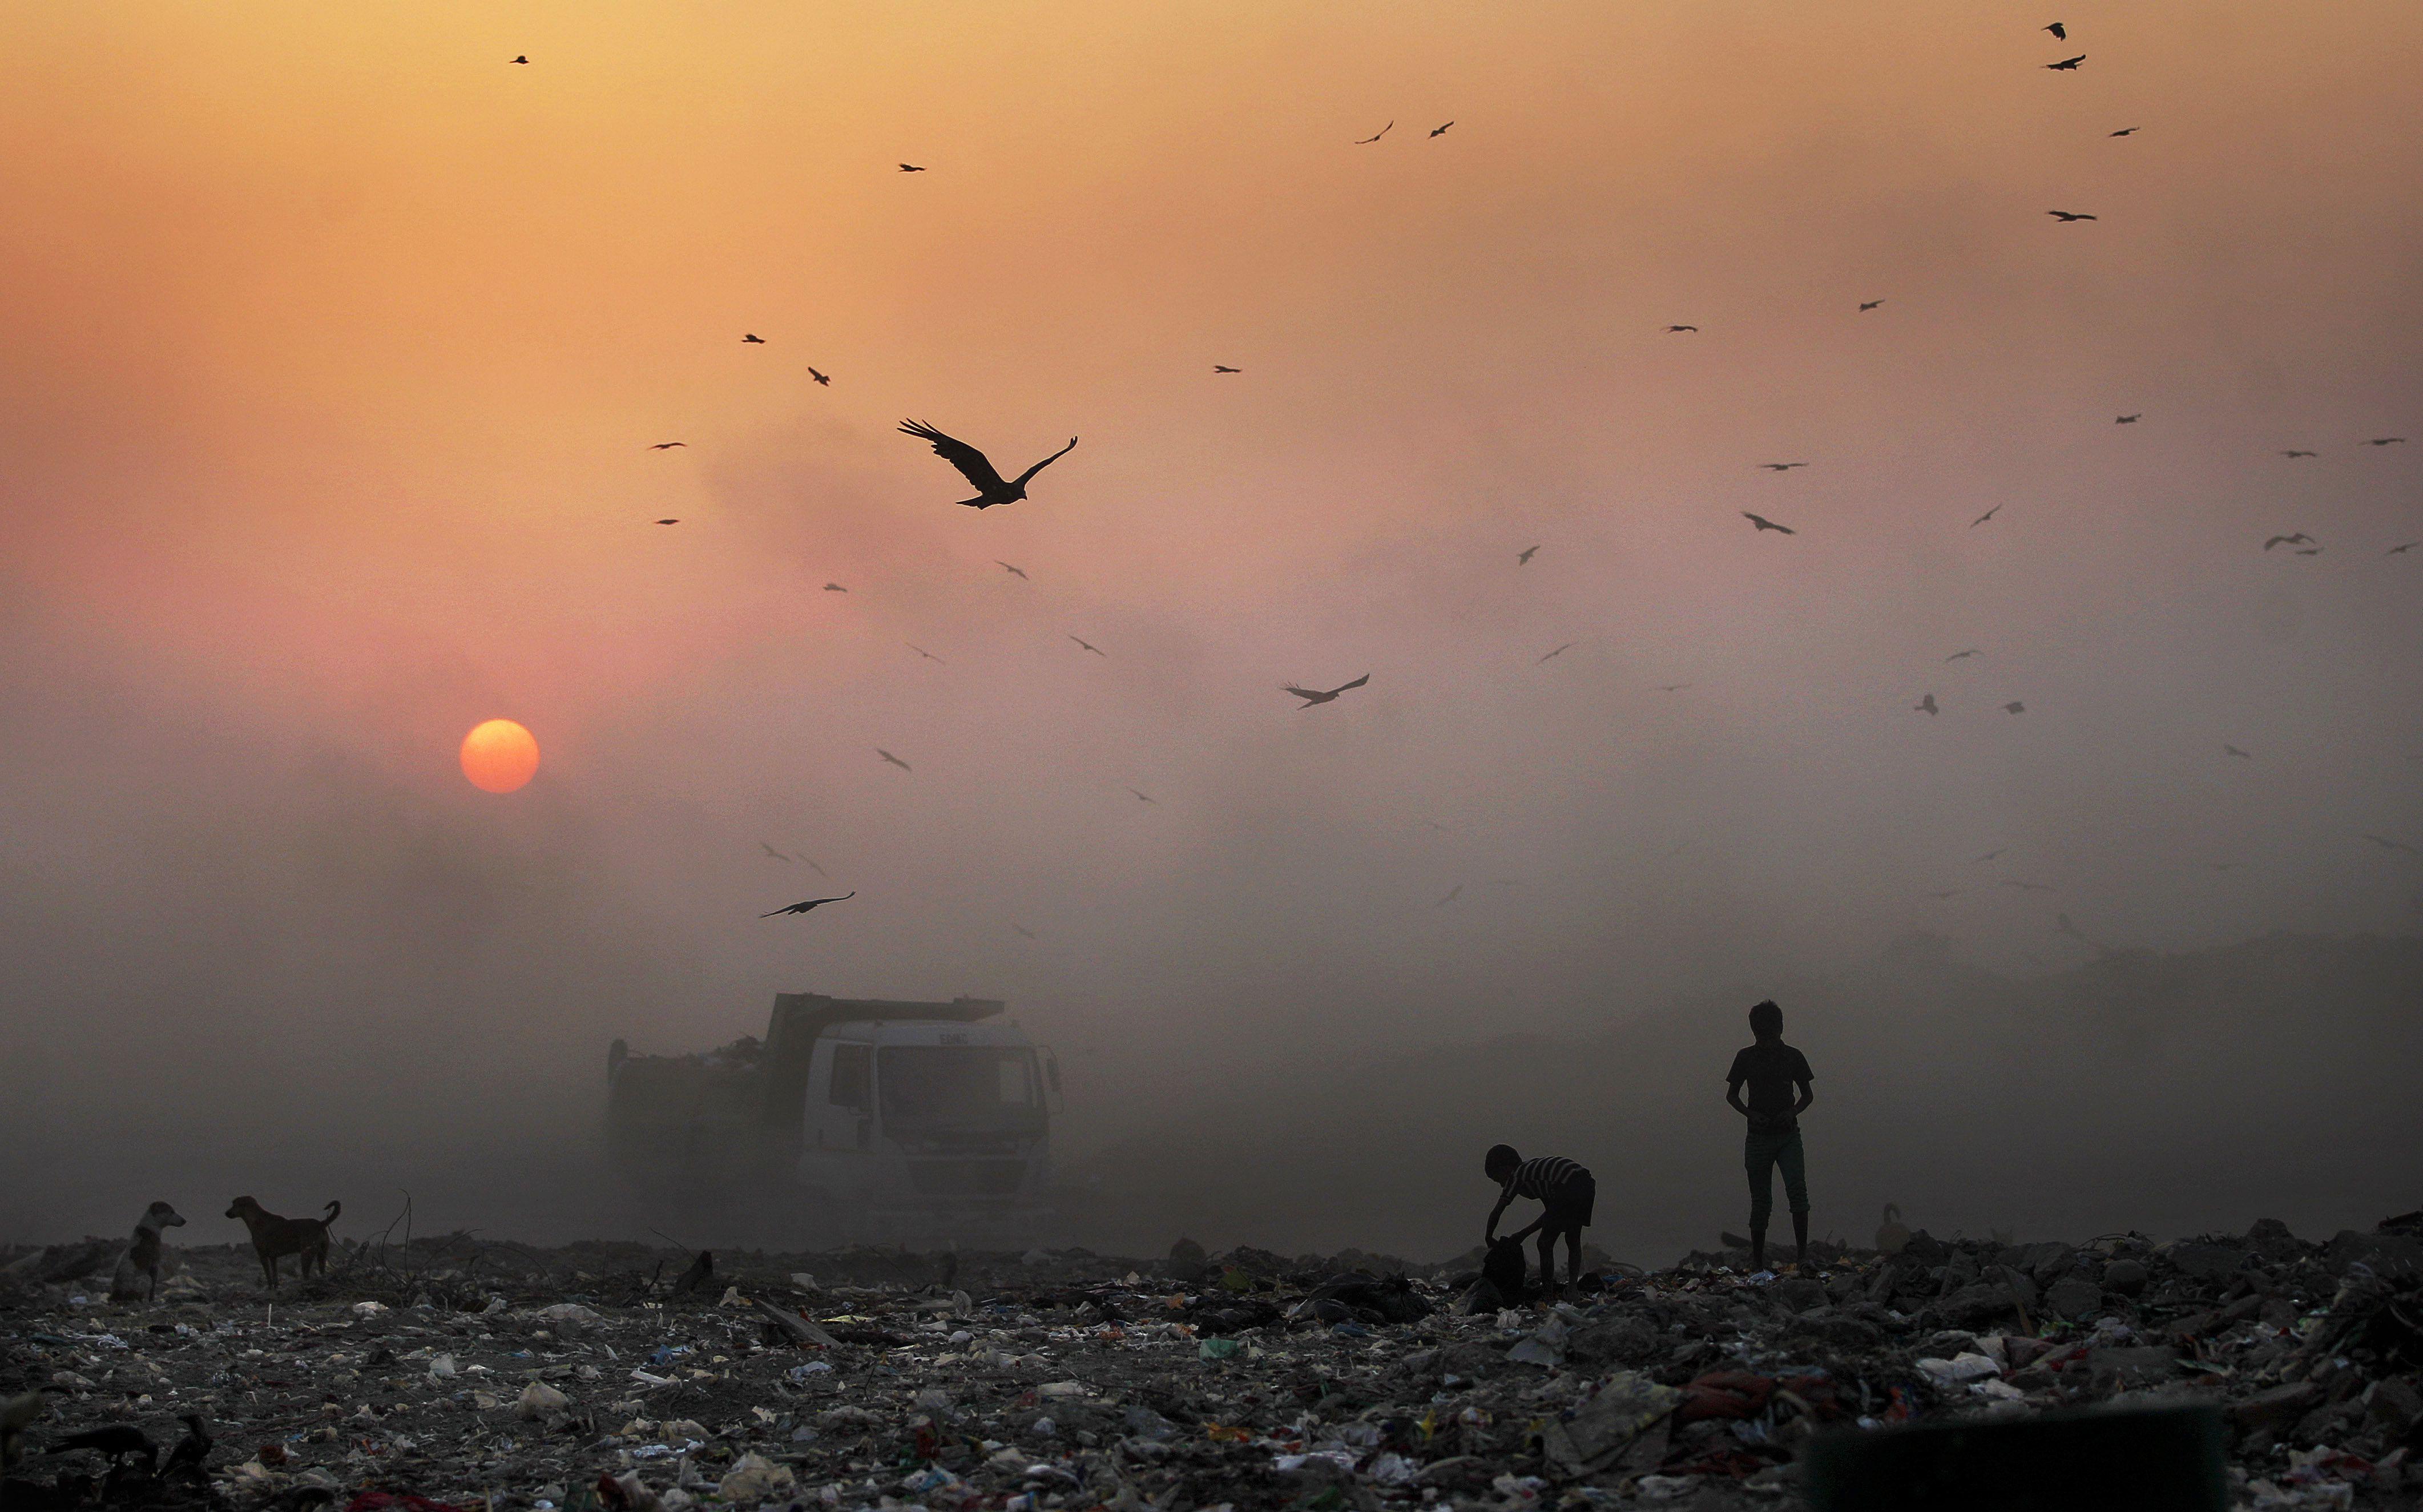 Landfill in India